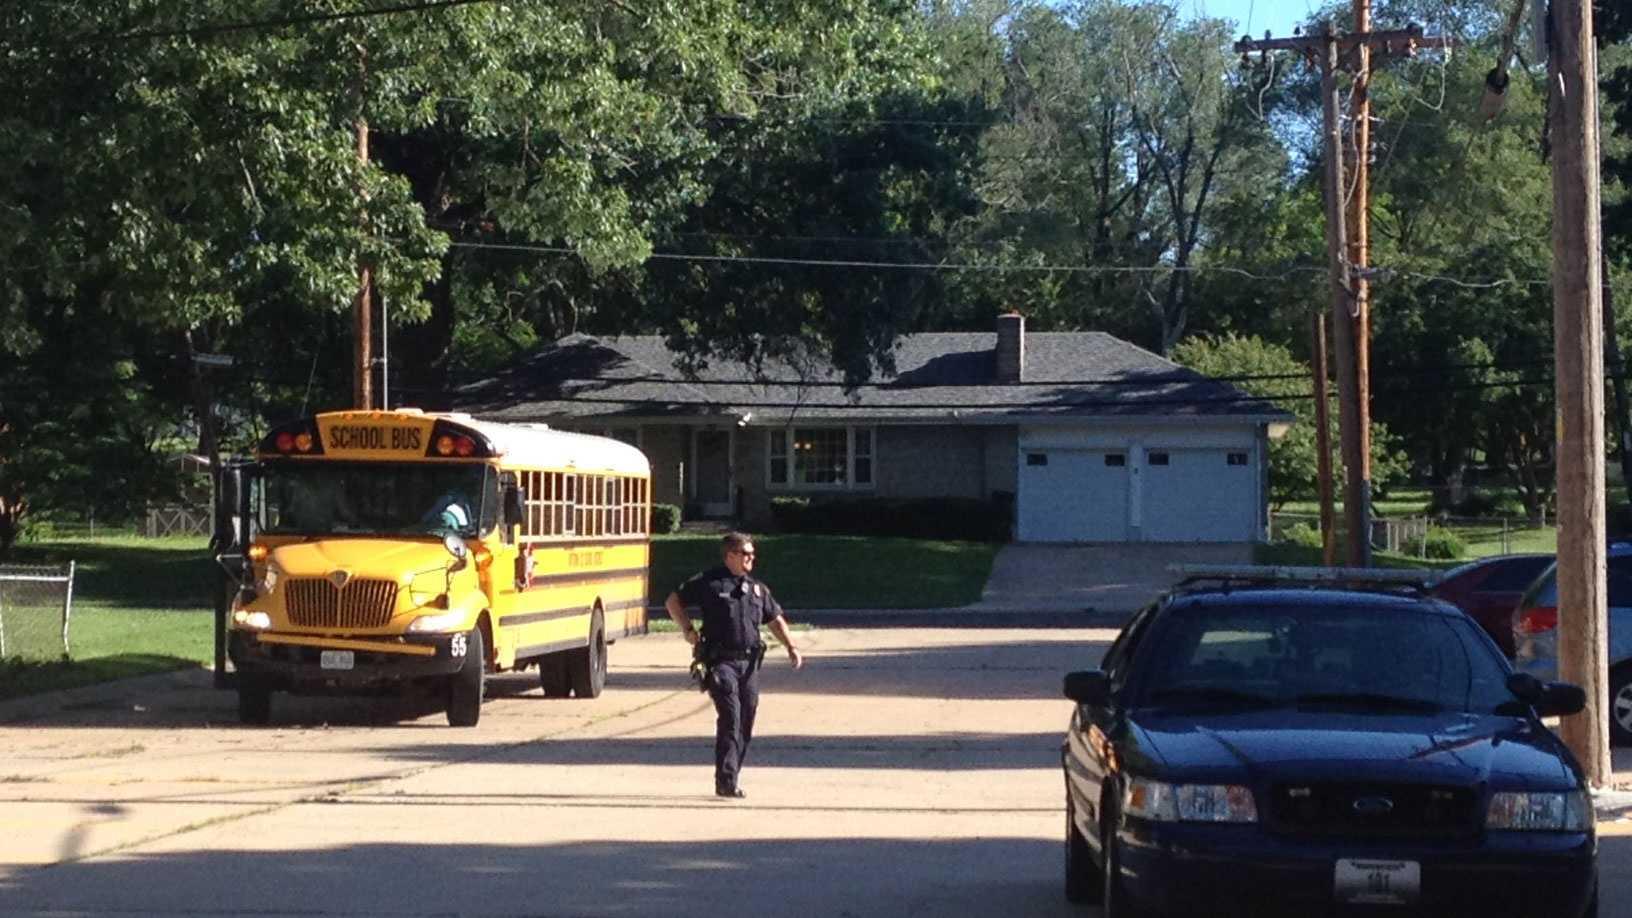 Pedestrian hit by school bus